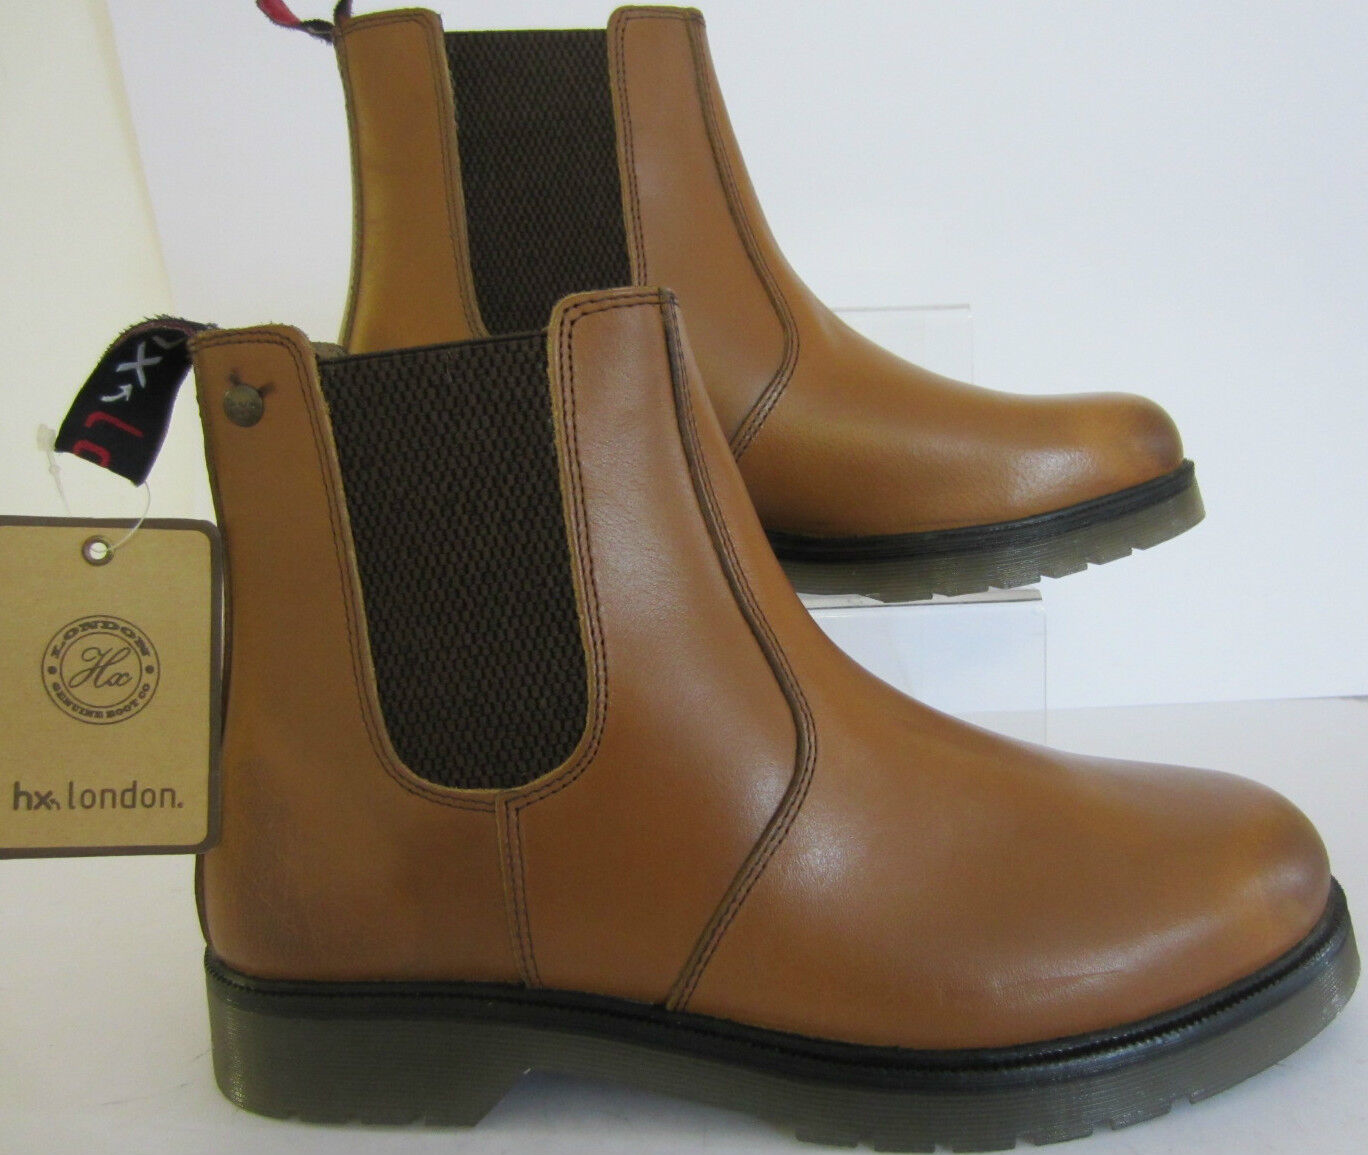 Hx, london Mens Smart Chelsea Boot (01700) Tan Sizes 7 x 10 & 42 (MR)